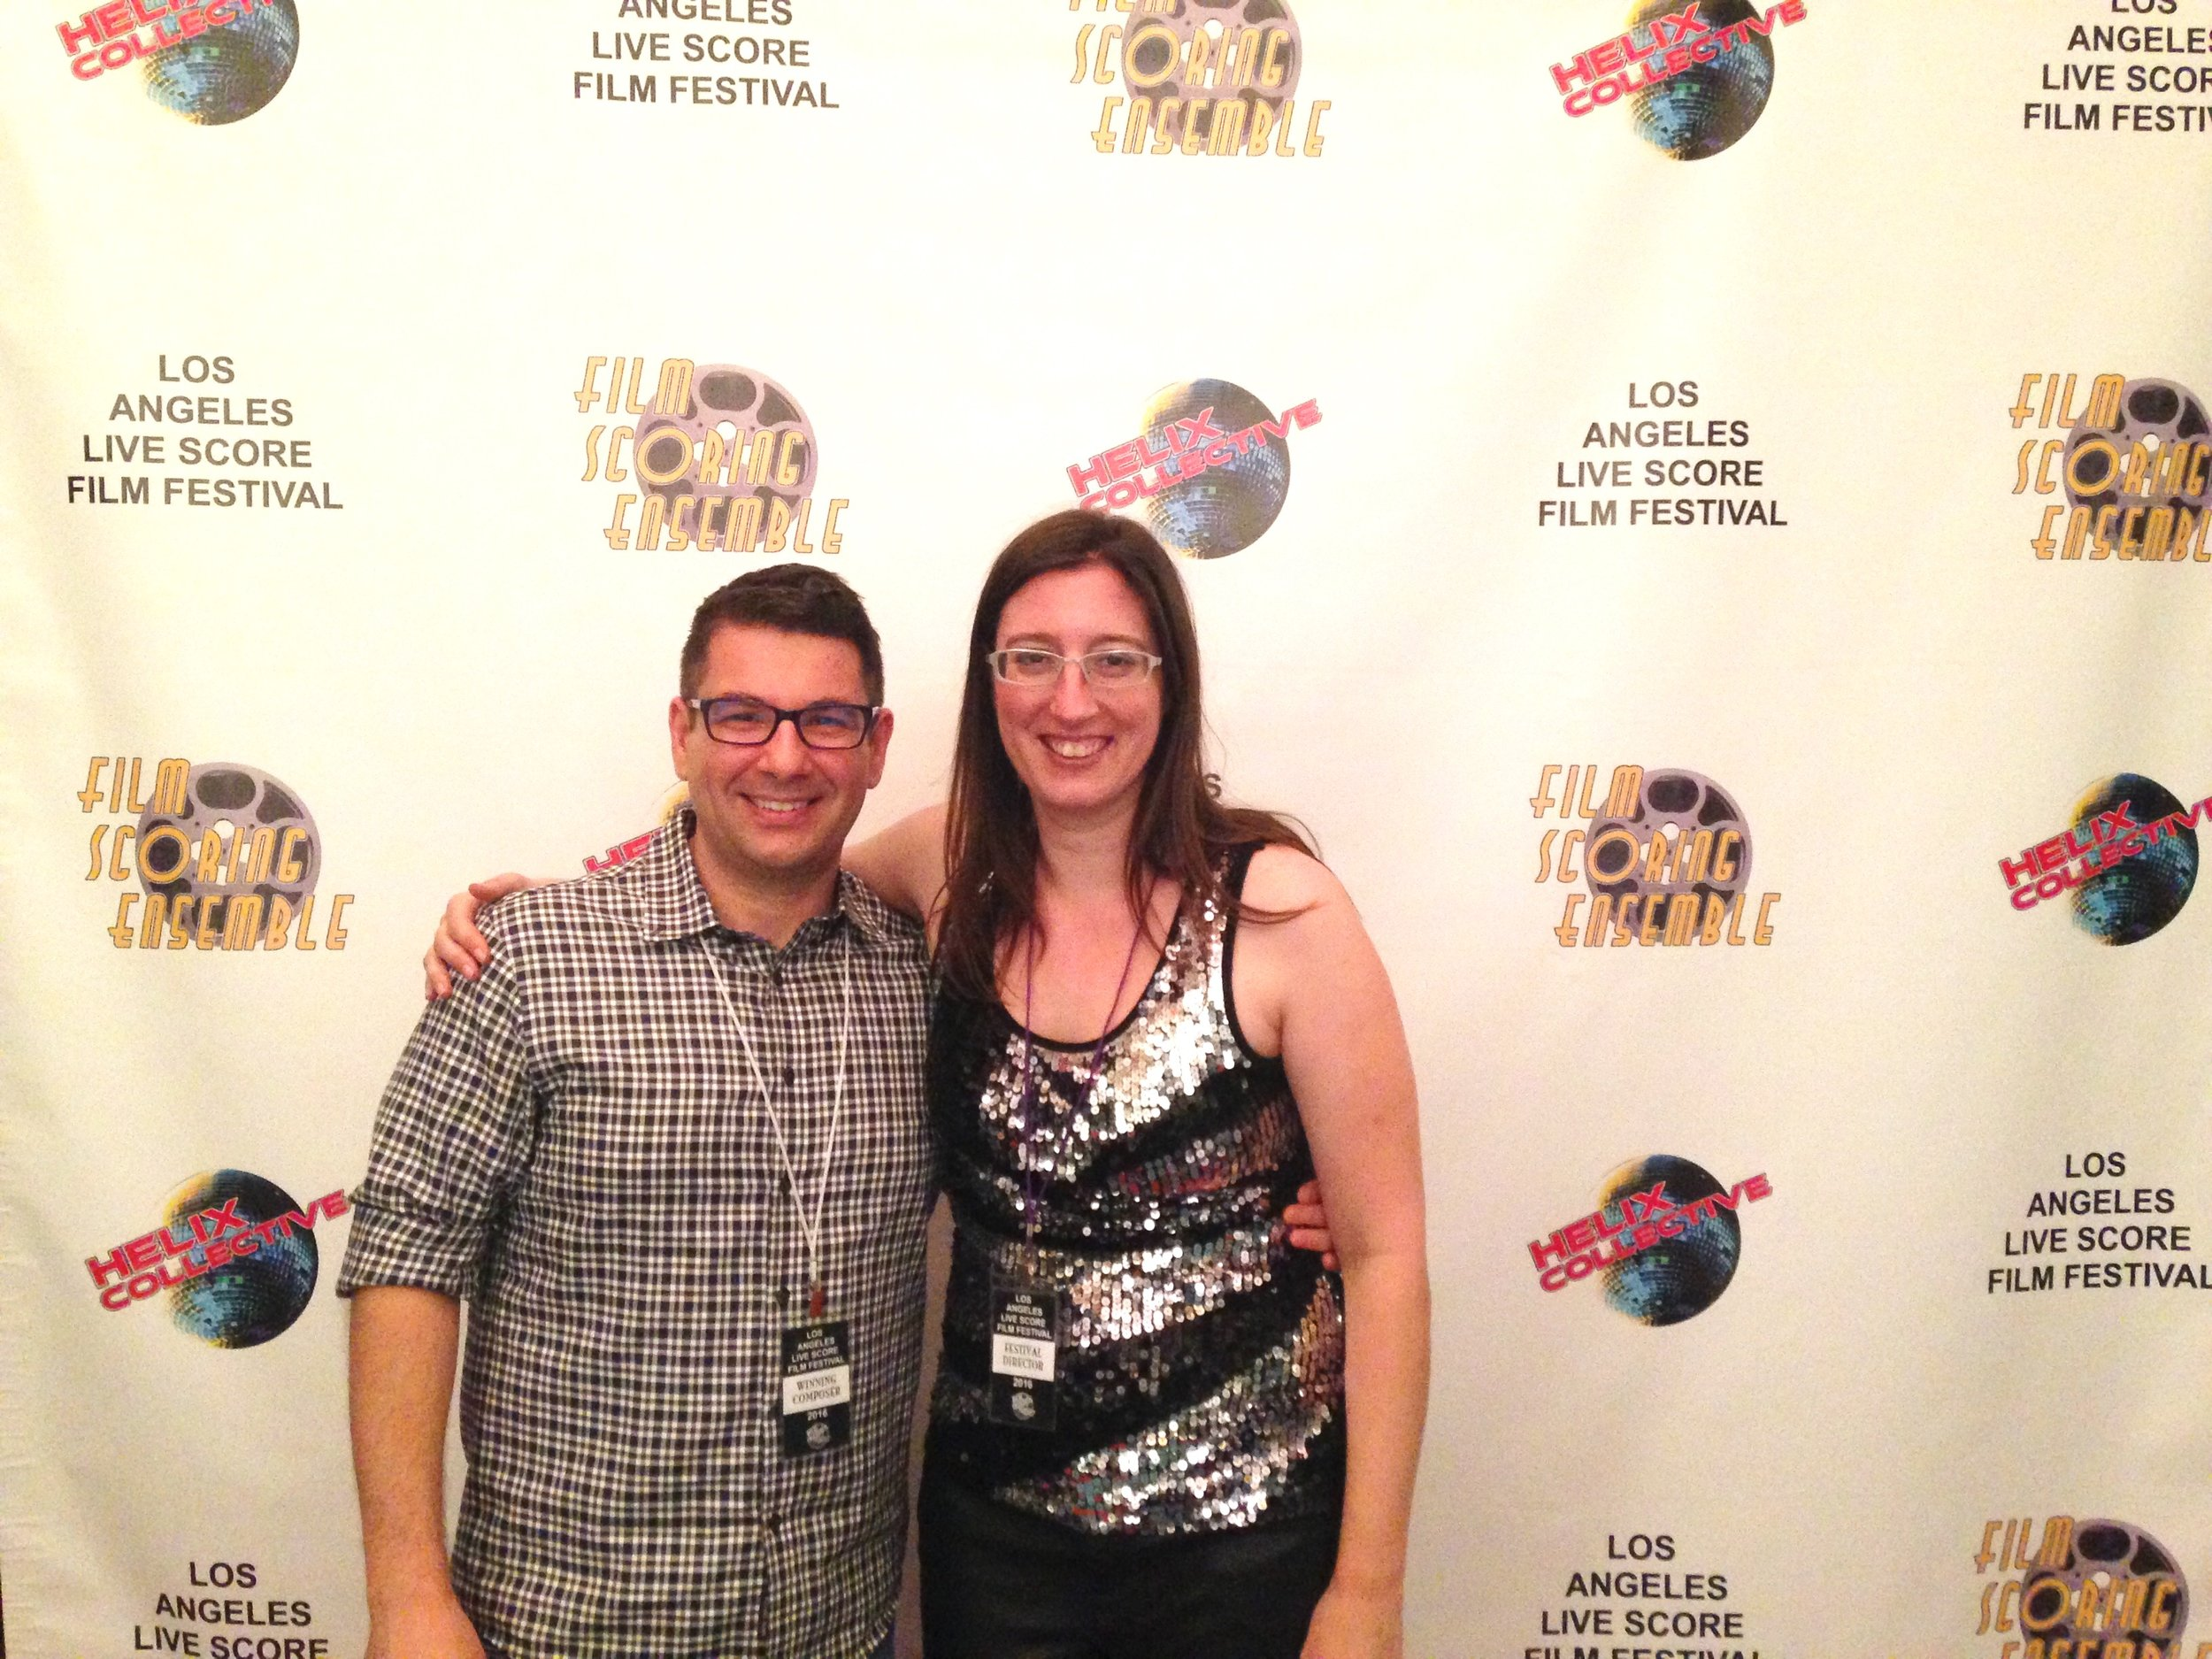 2016 Los Angeles Live Score Film Festival